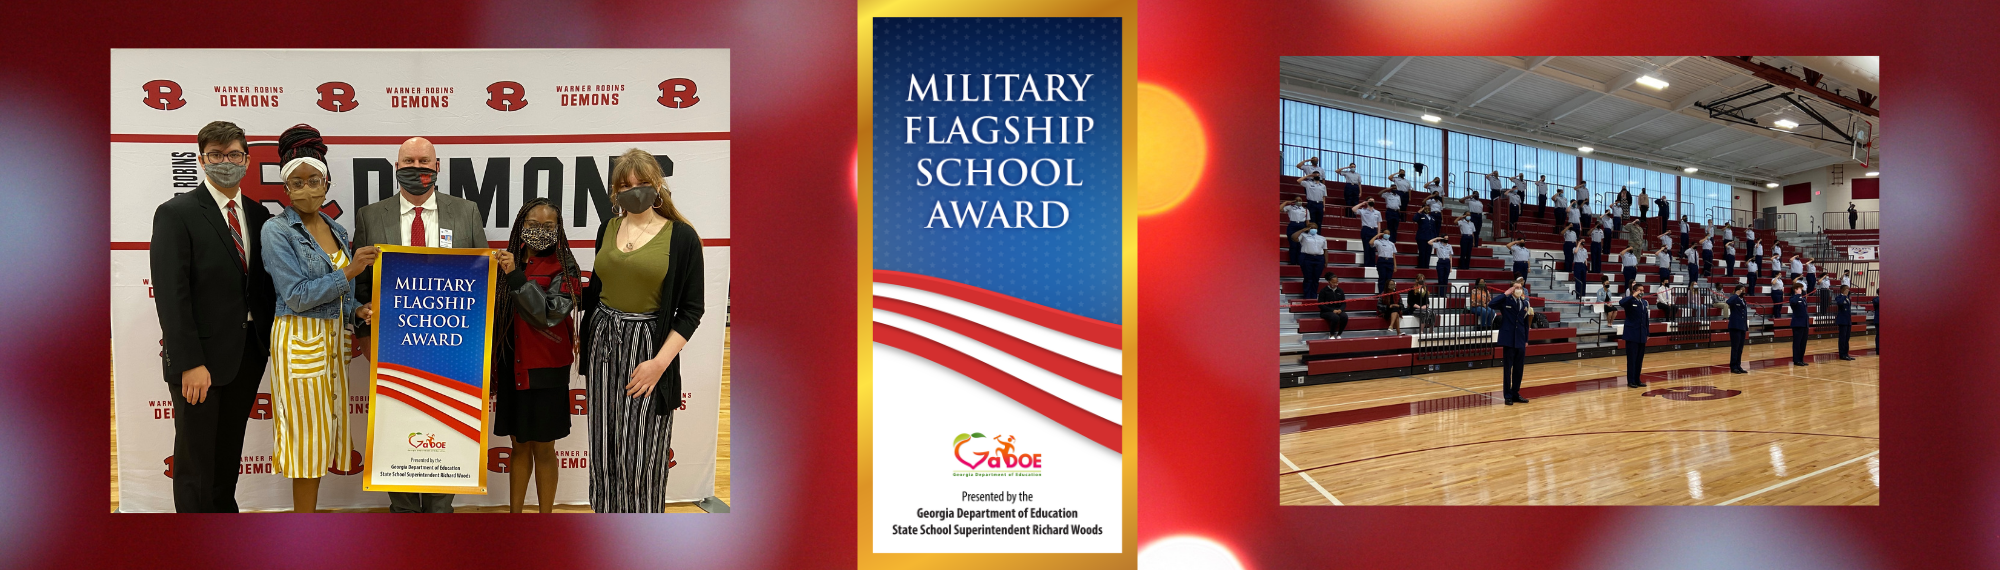 Military Flagship School Award